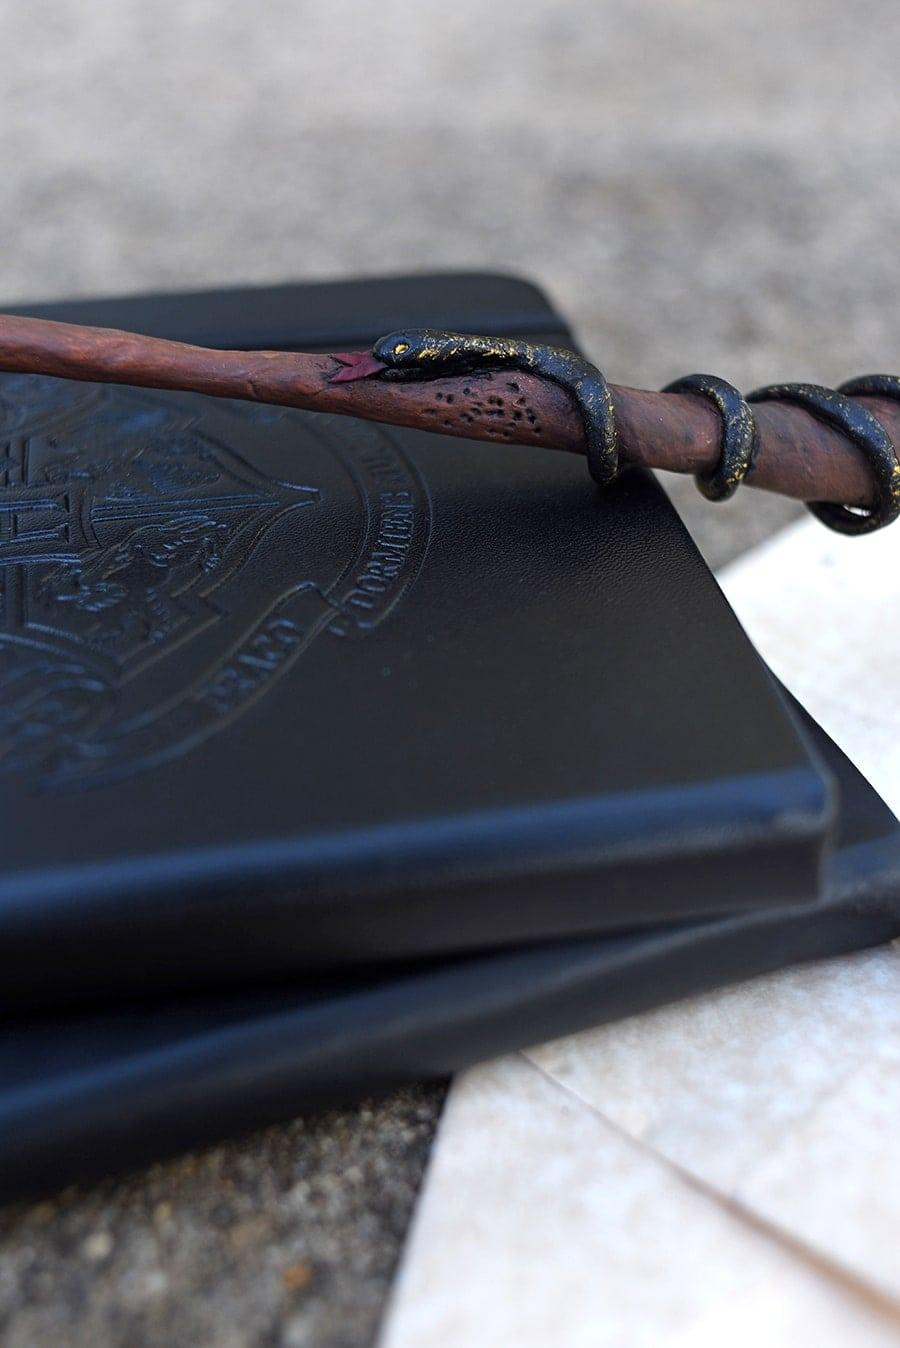 Harry Potter Wizarding World 5028 Web - DIY Harry Potter Wands